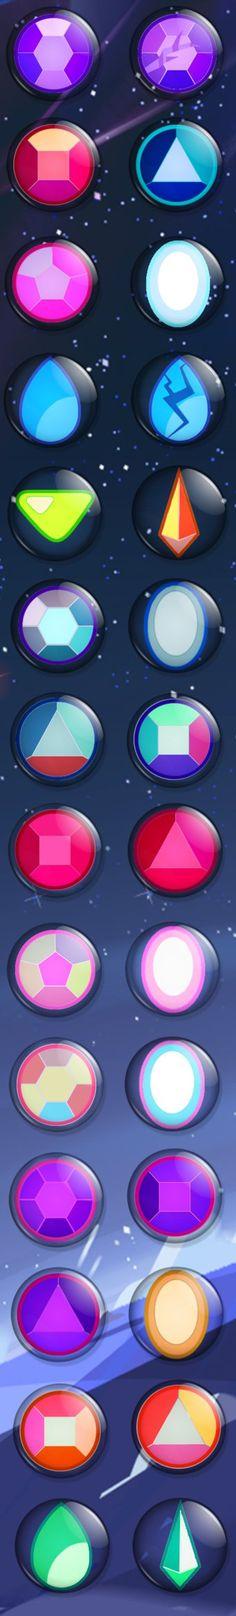 Steven Universe Gem Buttons - Otakuthon 2015 by Wingrott on DeviantArt